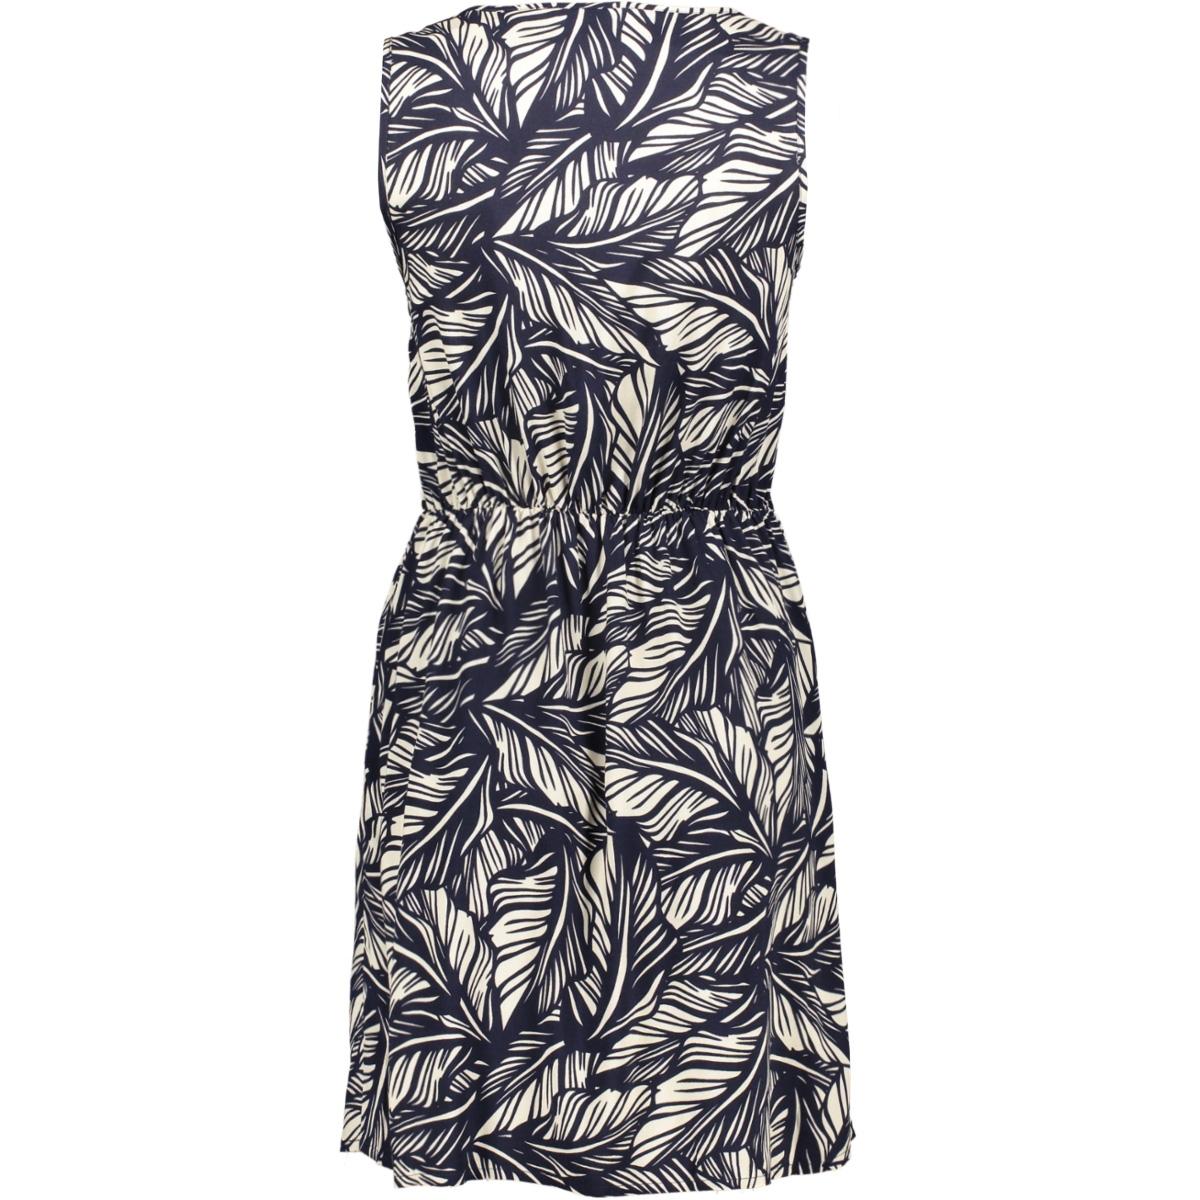 vmsimply easy sl short dress 10211484 vero moda jurk night sky/litas